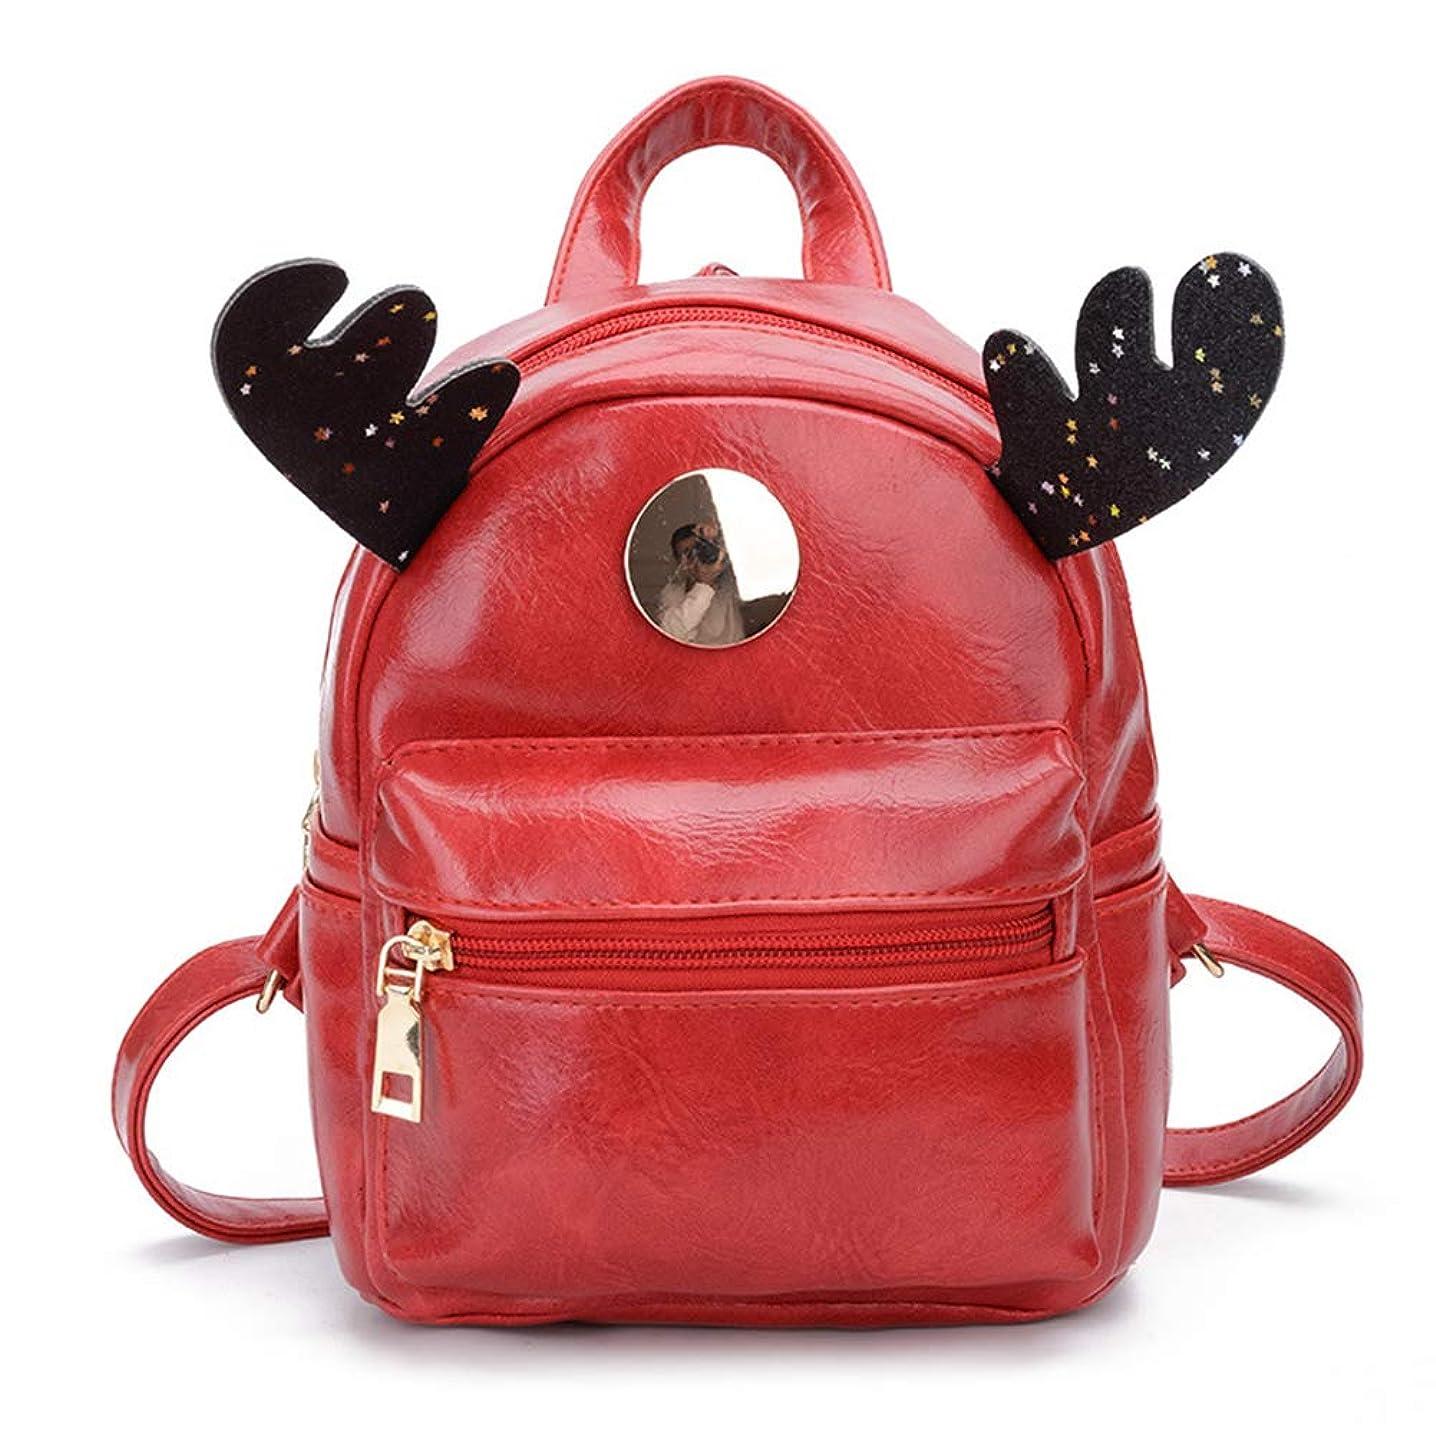 Backpacks&Cute Deer Faux Leather Kids Backpack Children Student Casual School Bag Bookbag &for Daily School Gift